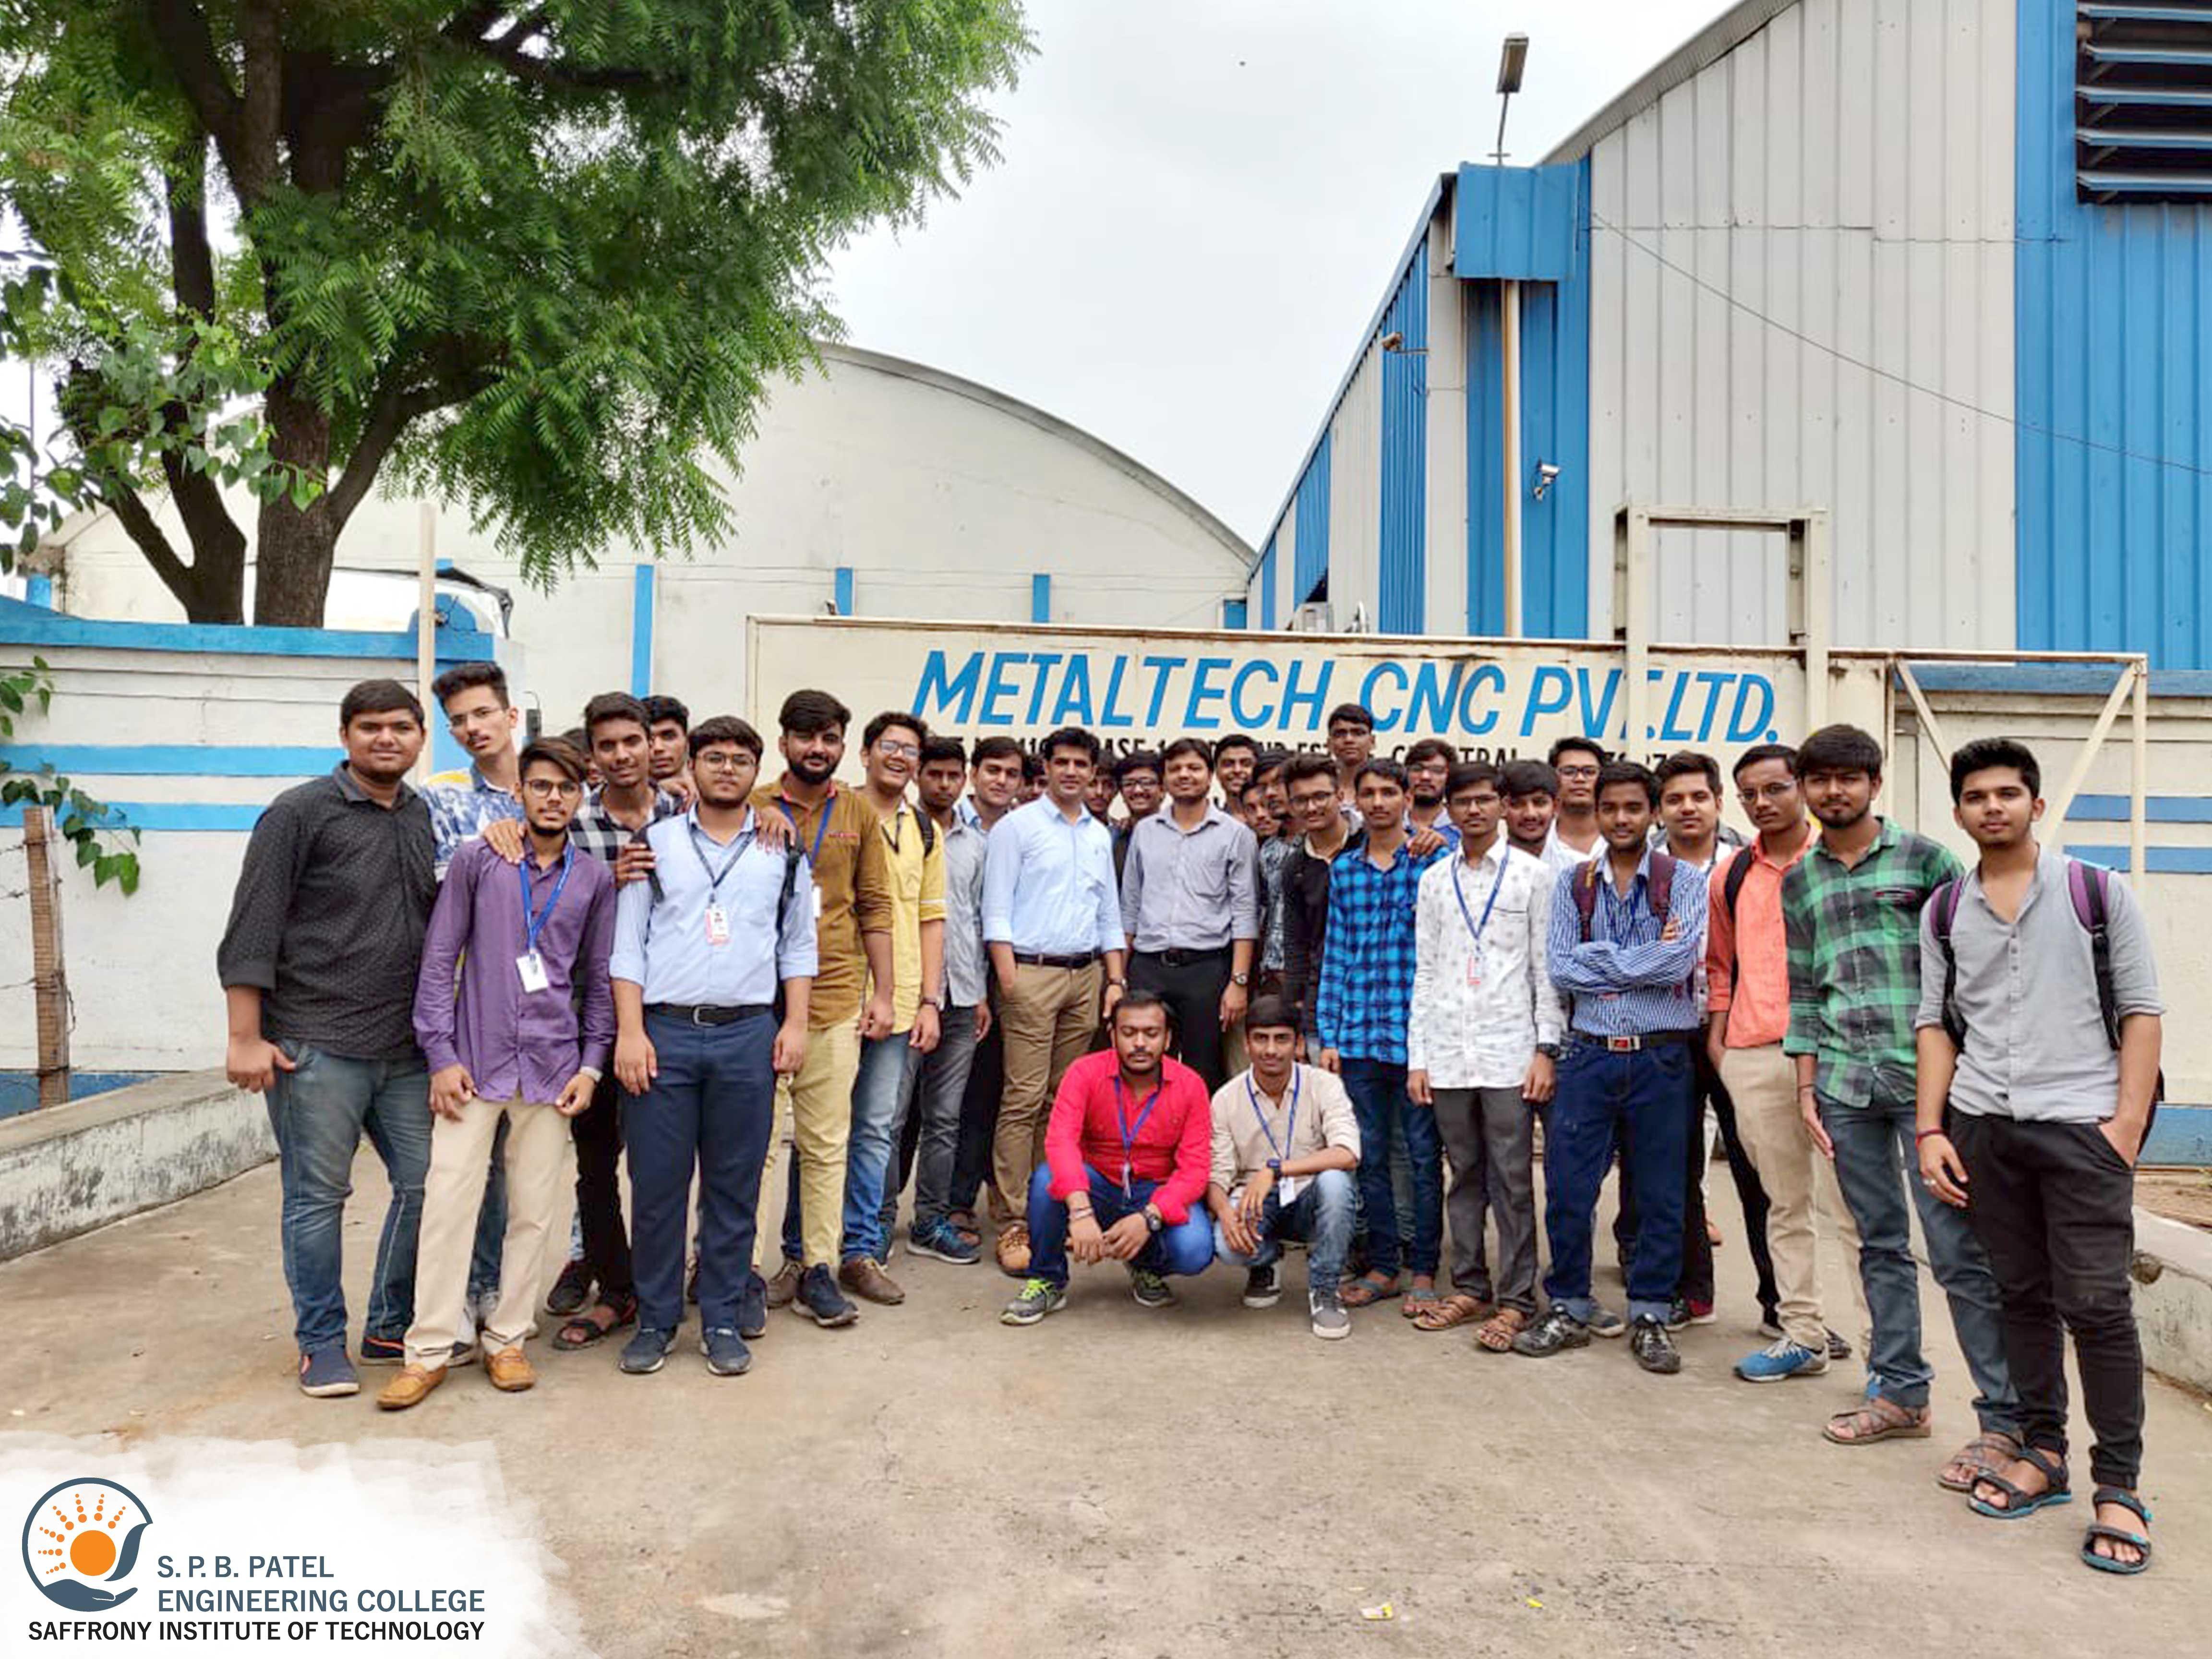 Saffrony Institute of Technology, Mechanical & Automobile